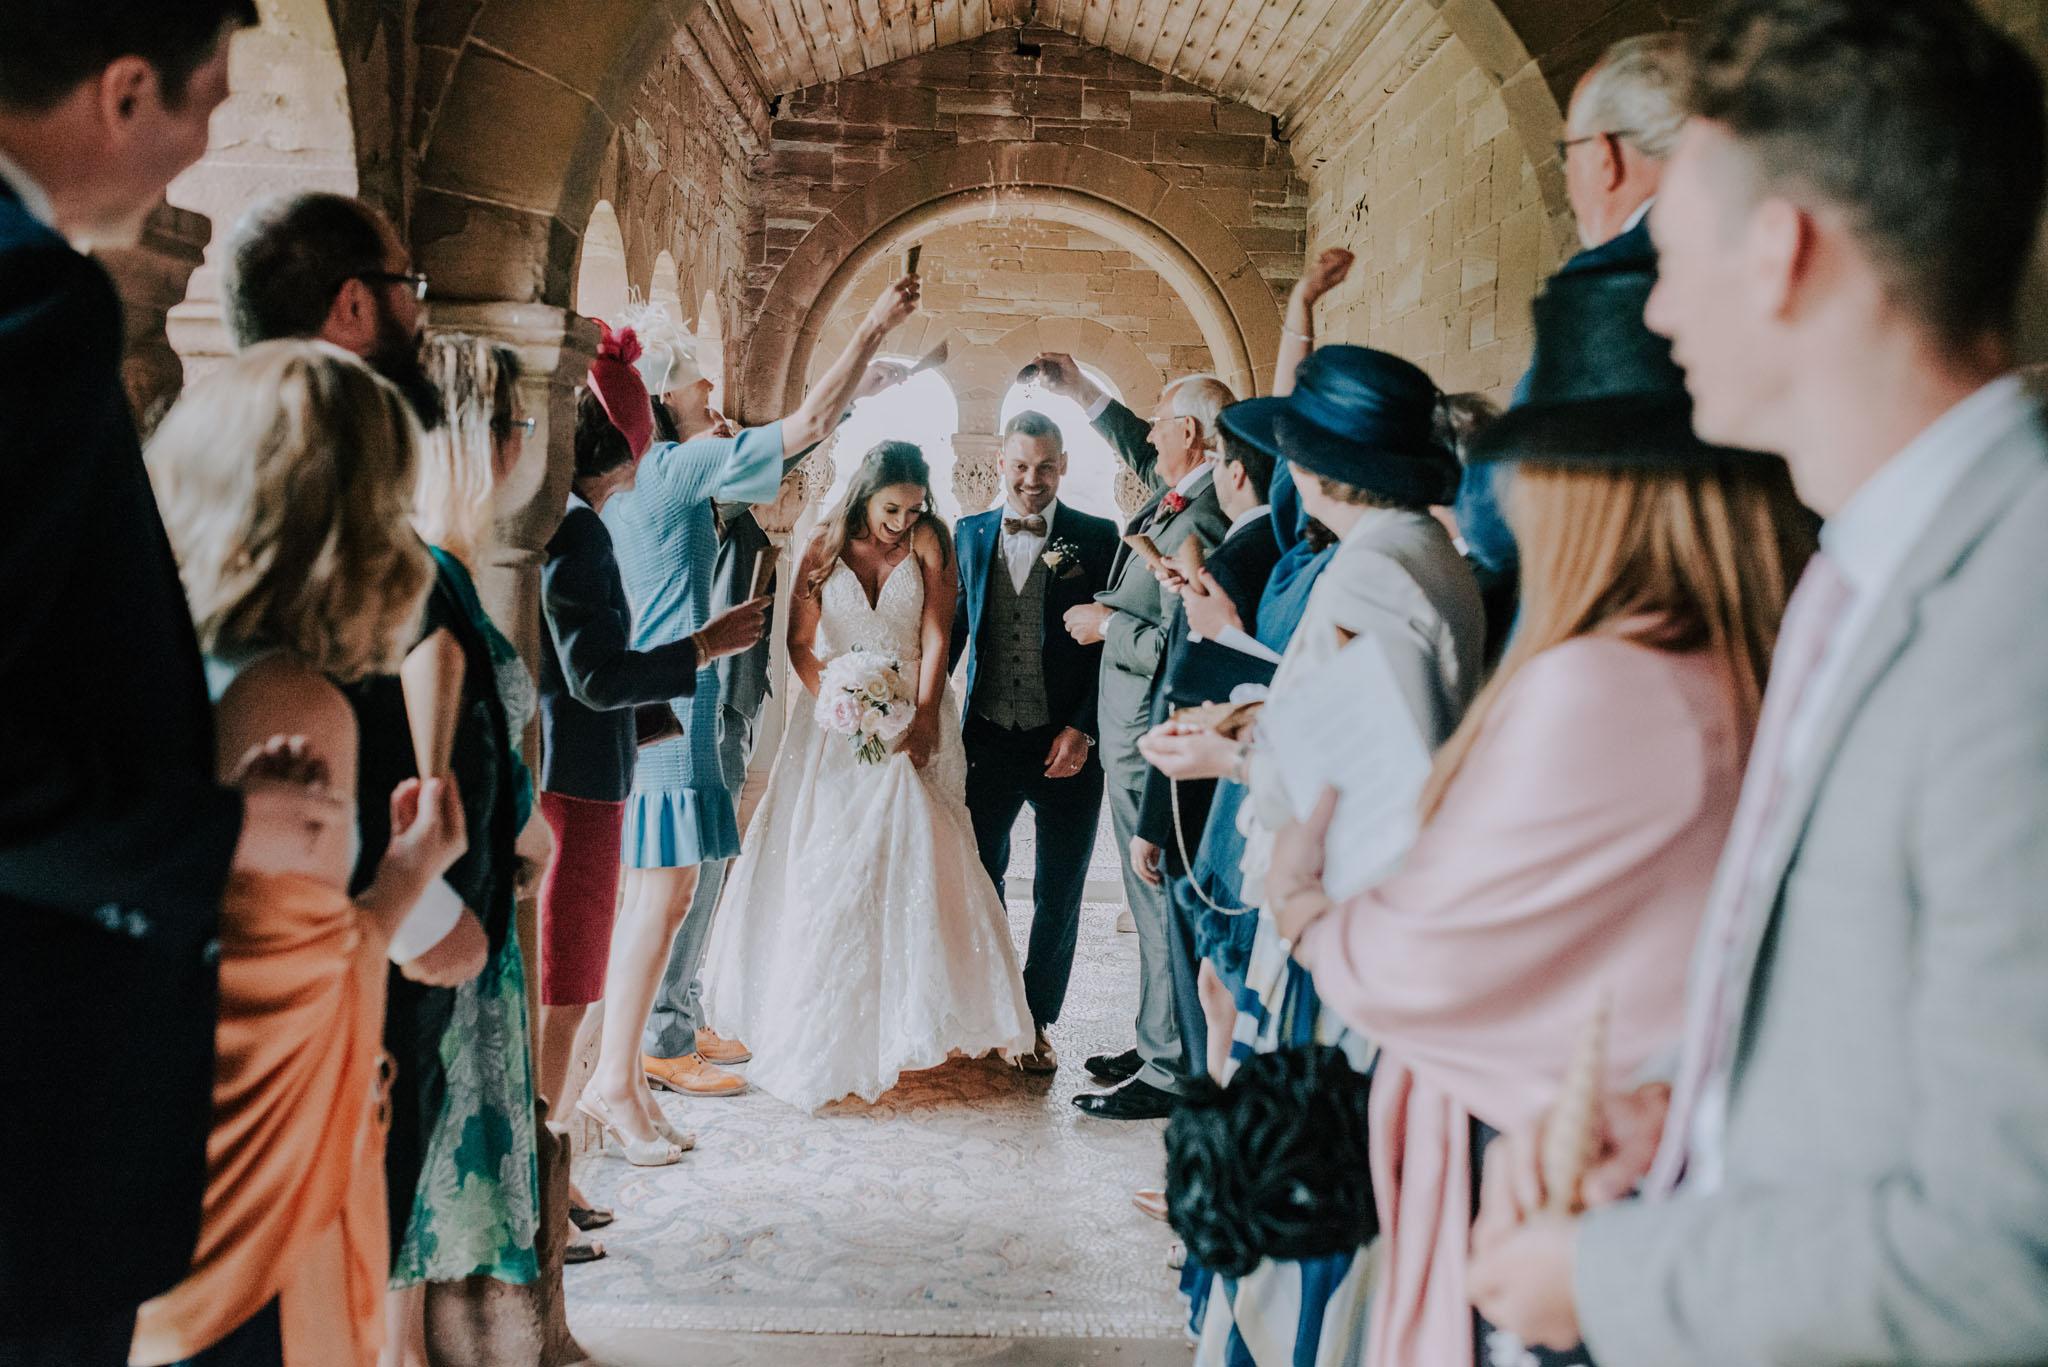 wedding-photographer-glewstone-court-hereford-scott-stockwell-photography257.jpg